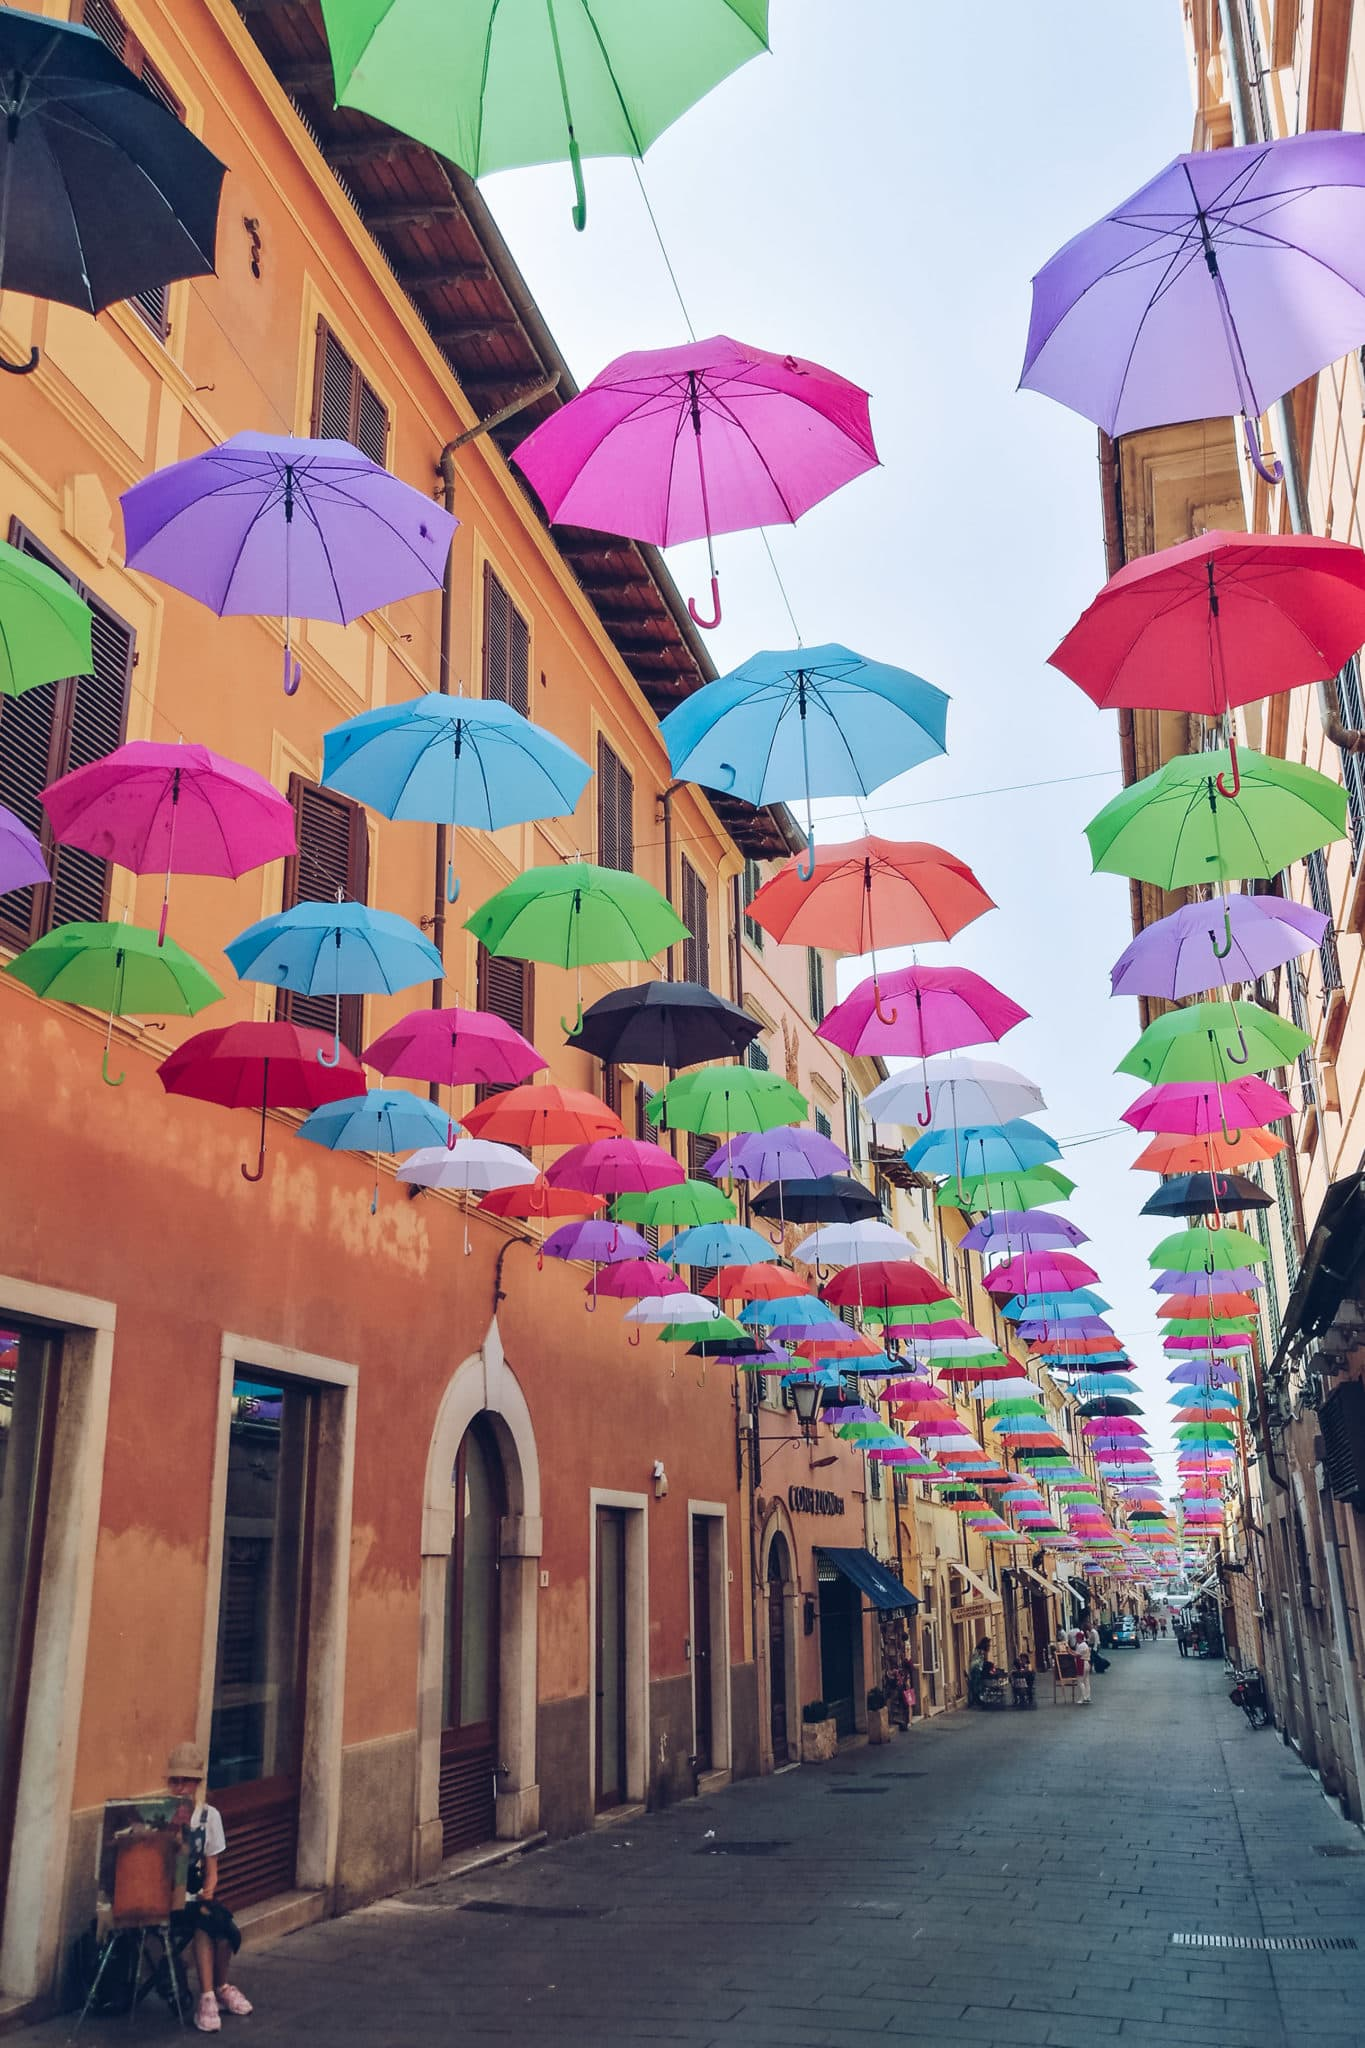 Floating Umbrellas In Pietrasanta My Travel In Tuscany